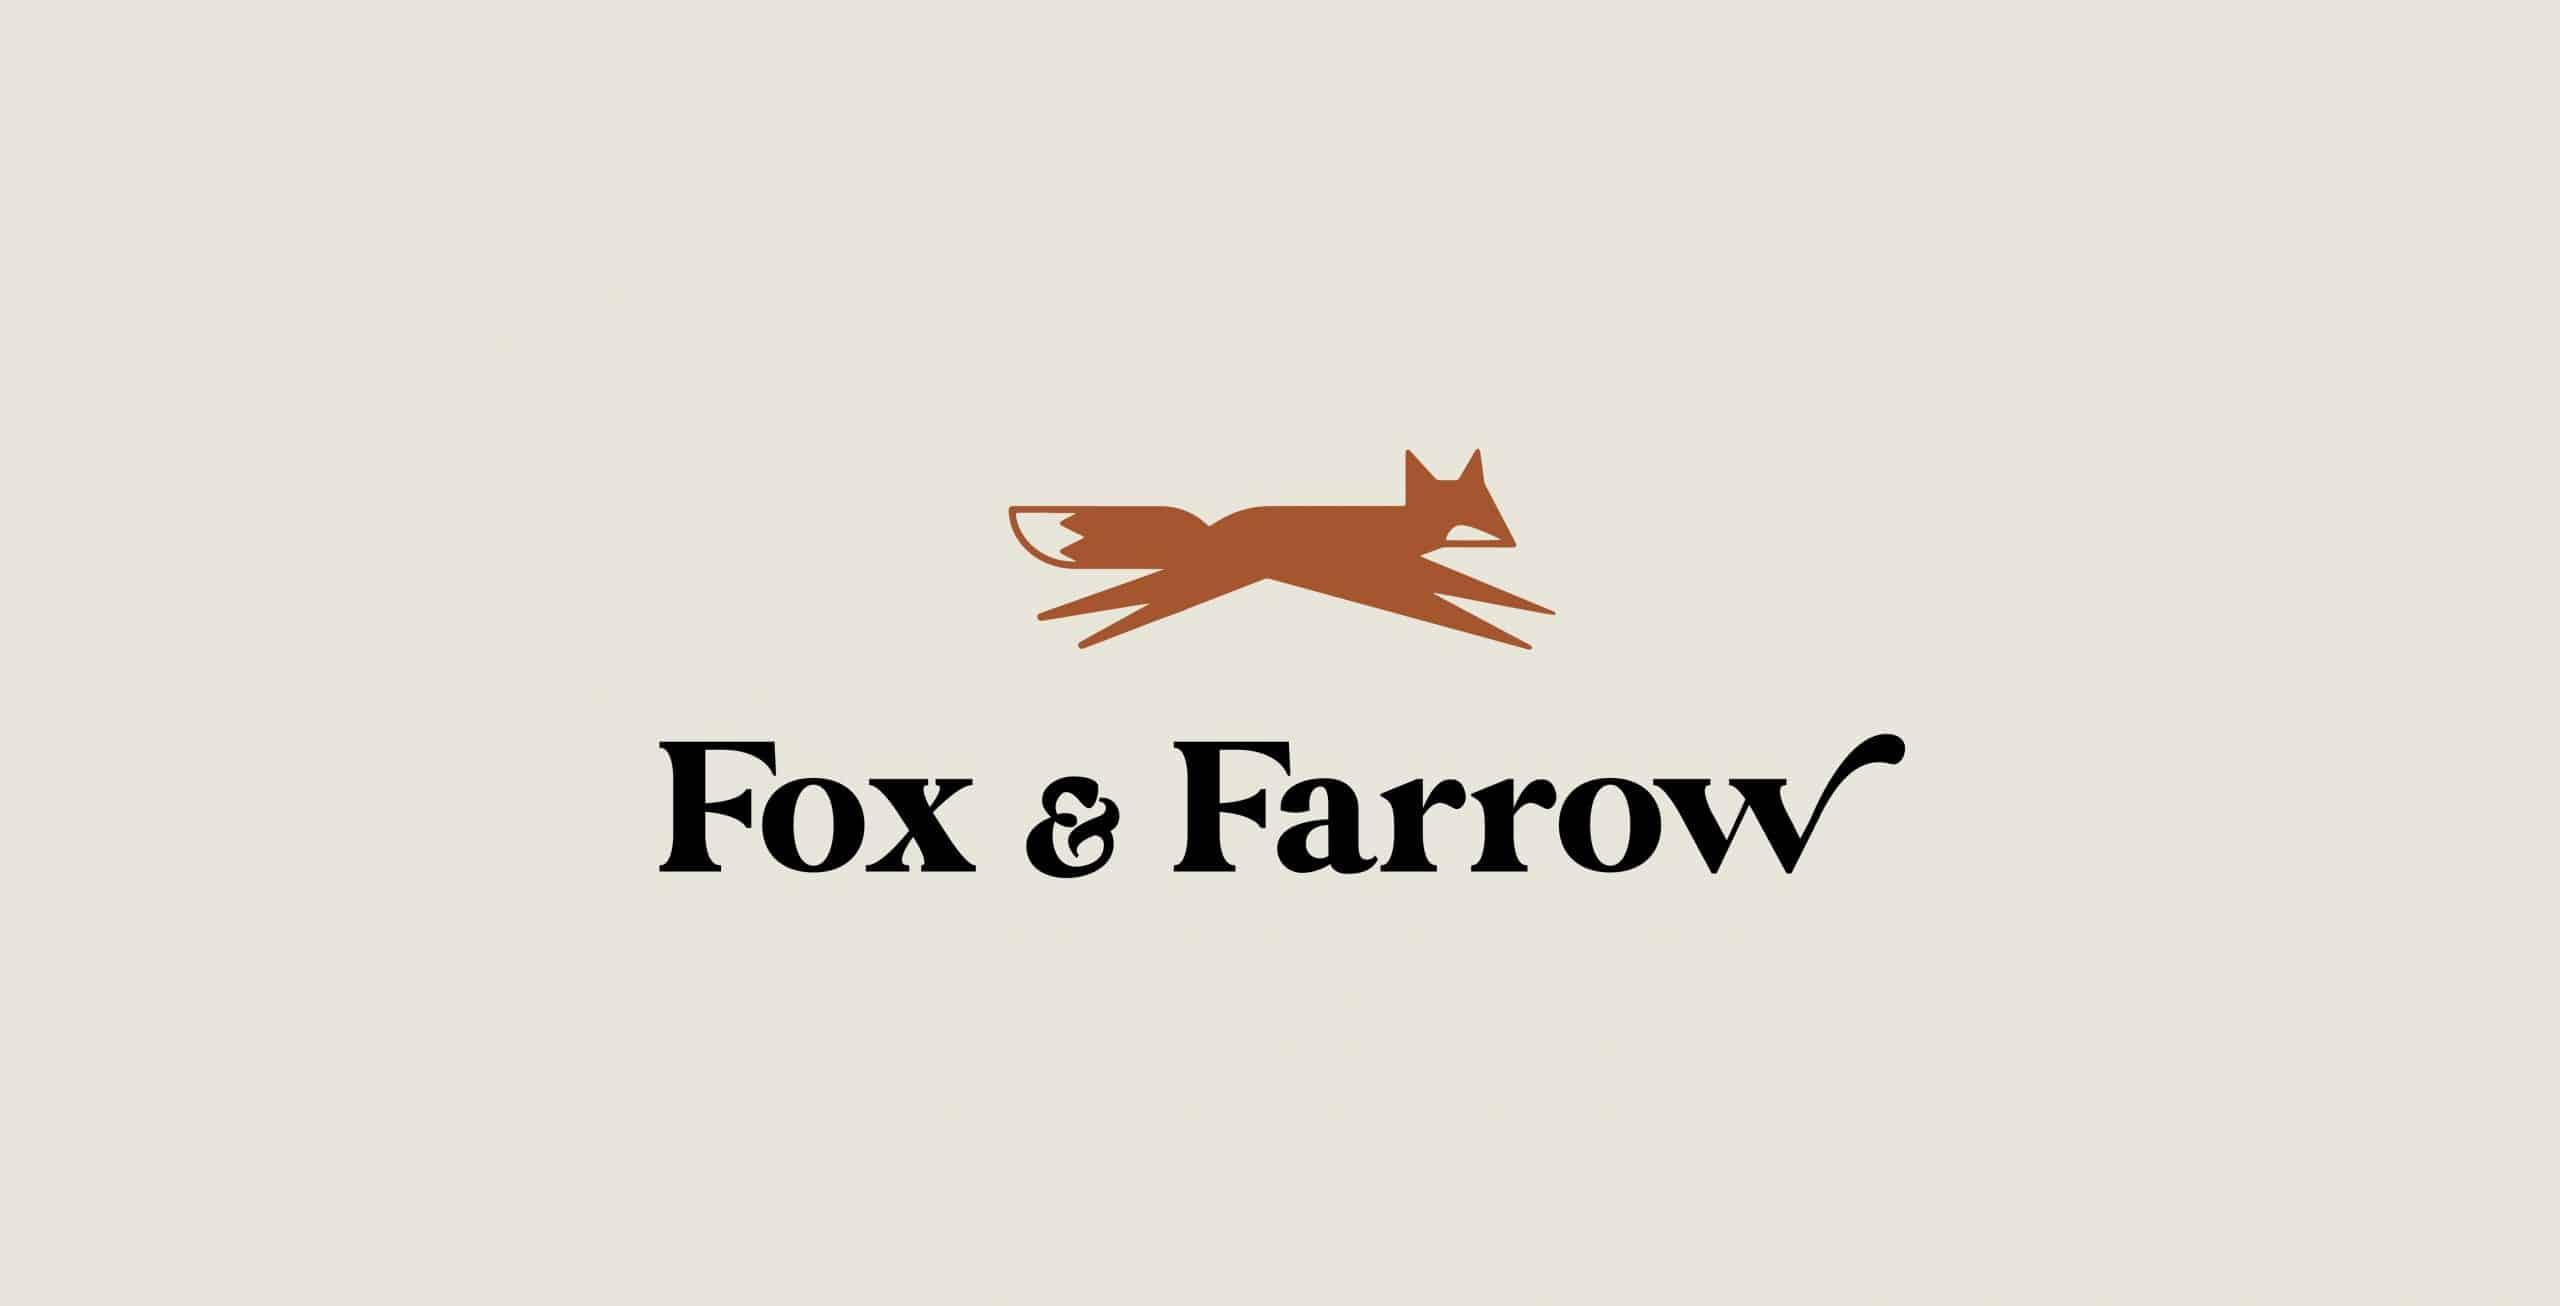 Stellen_Design_Fox_Farrow_Resturant_Branding_Logo_Design-10